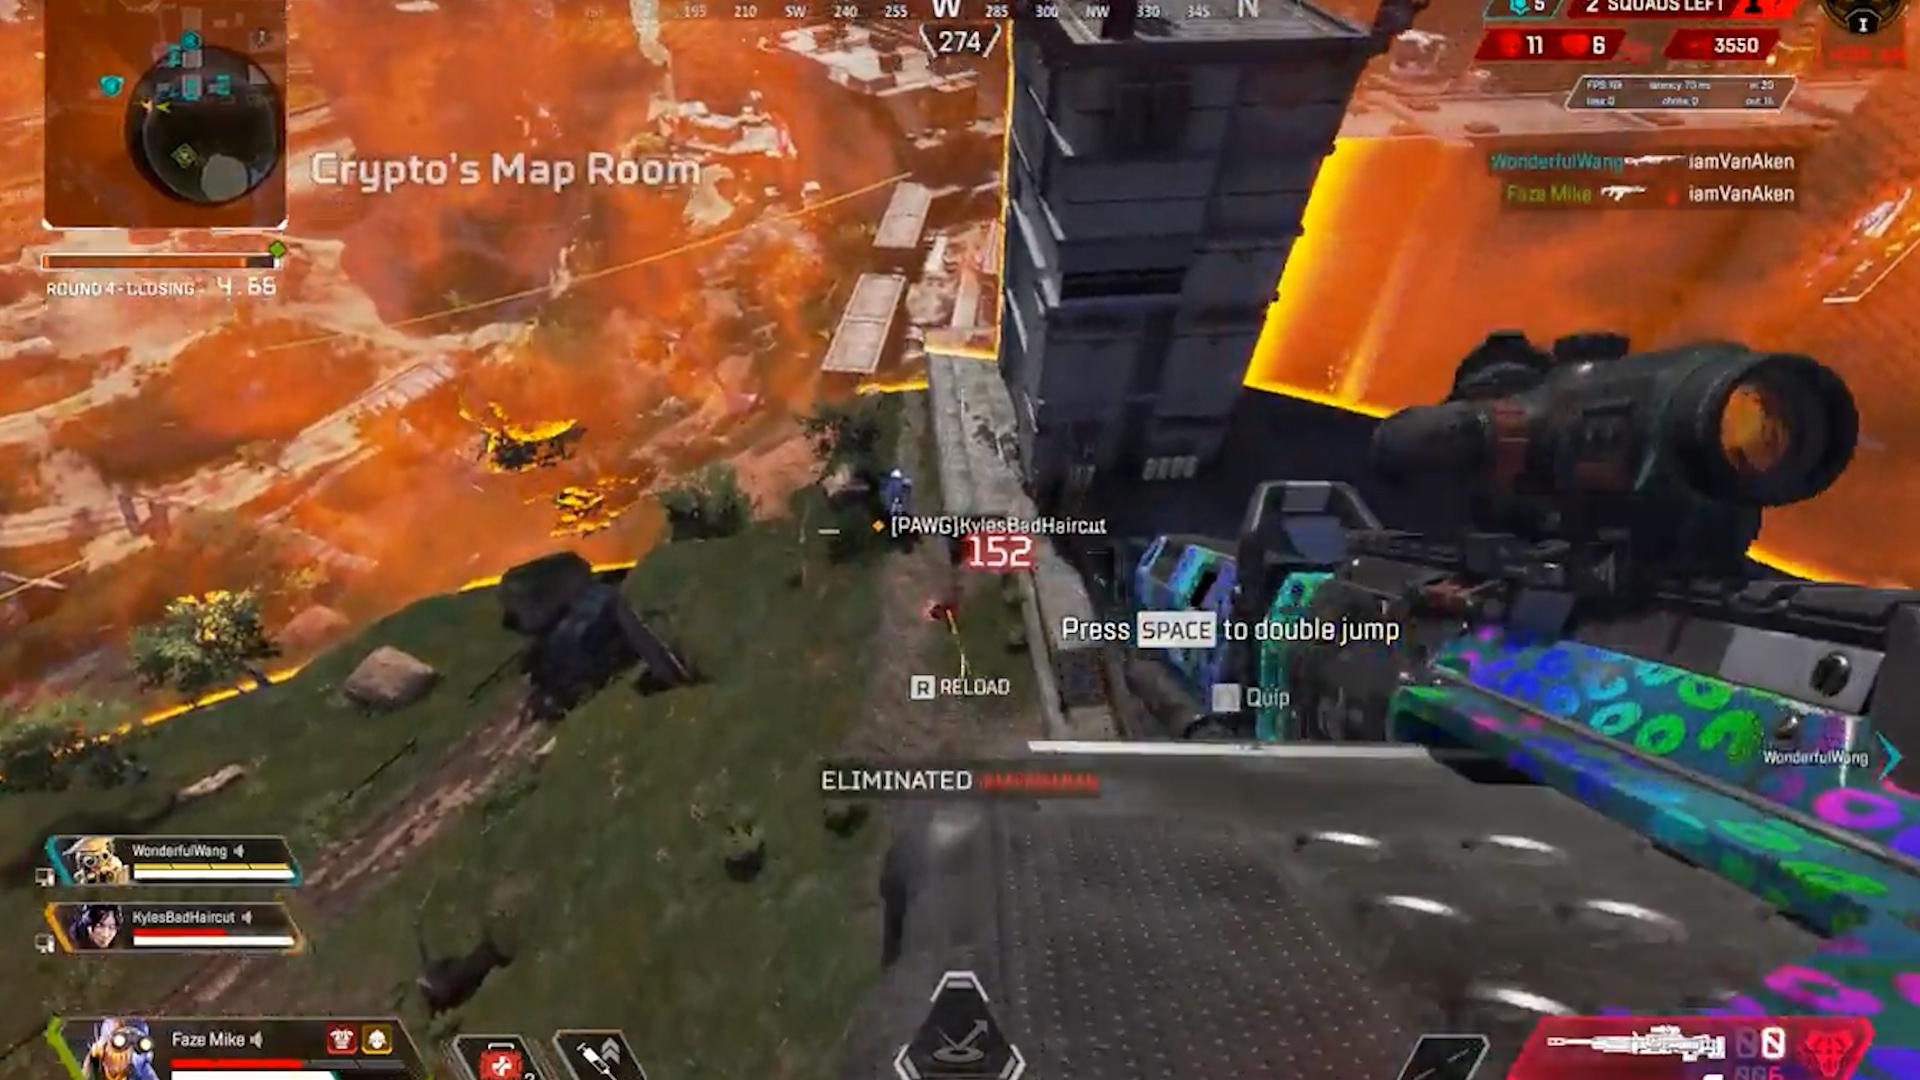 【APEX】空中の腰撃ちクレーバーを当ててチャンピオンになるオクタン部隊